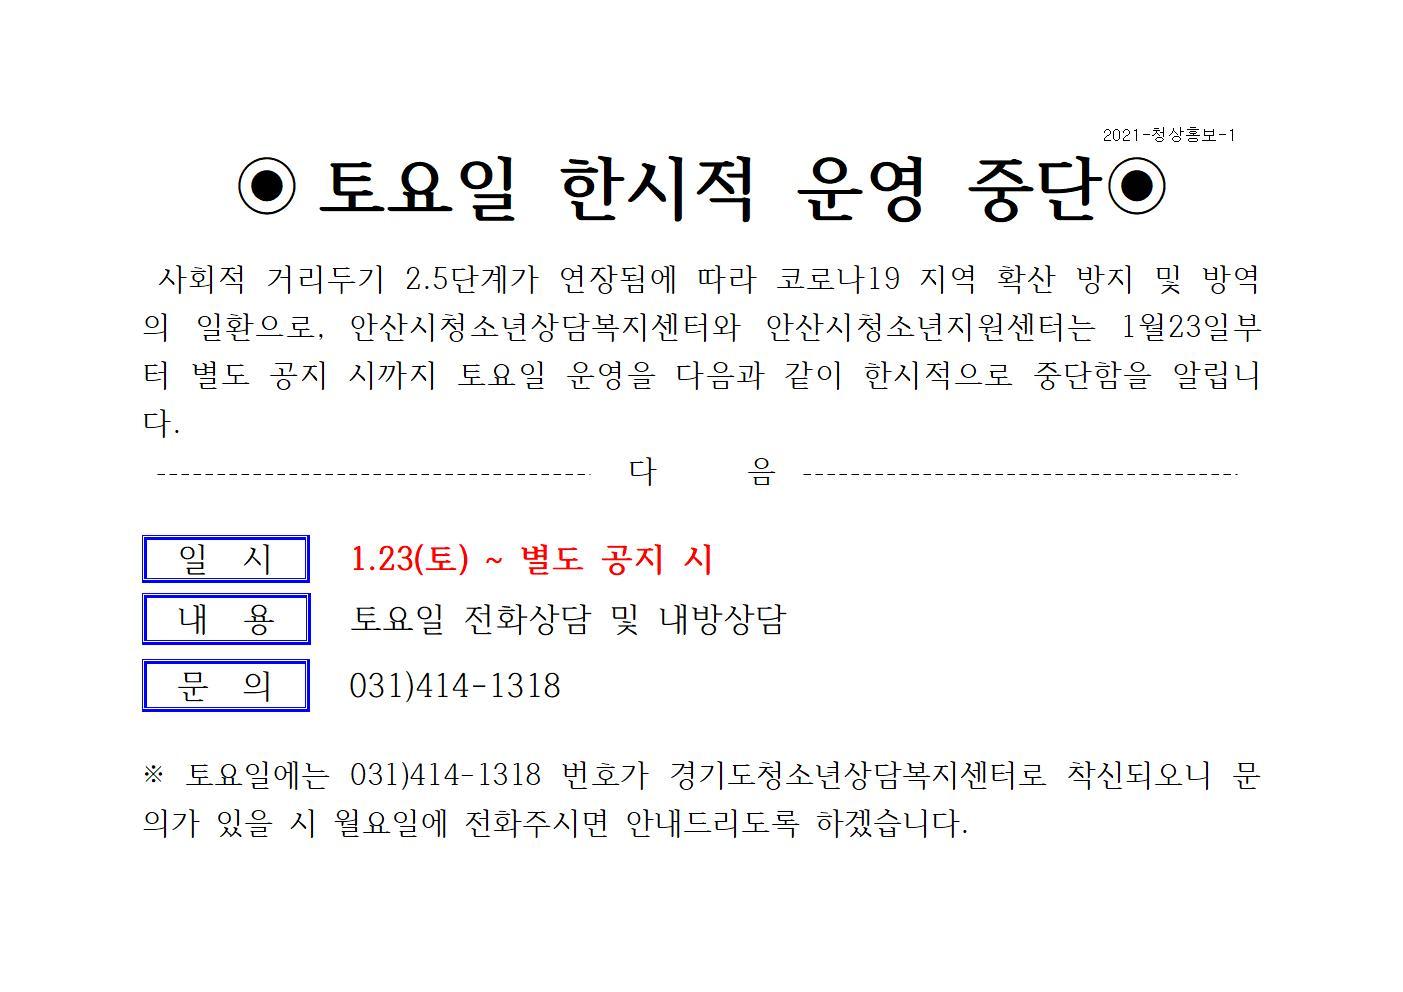 c5d0be015f13561b2c030edc78ce4ed2_1611128618_8309.jpg